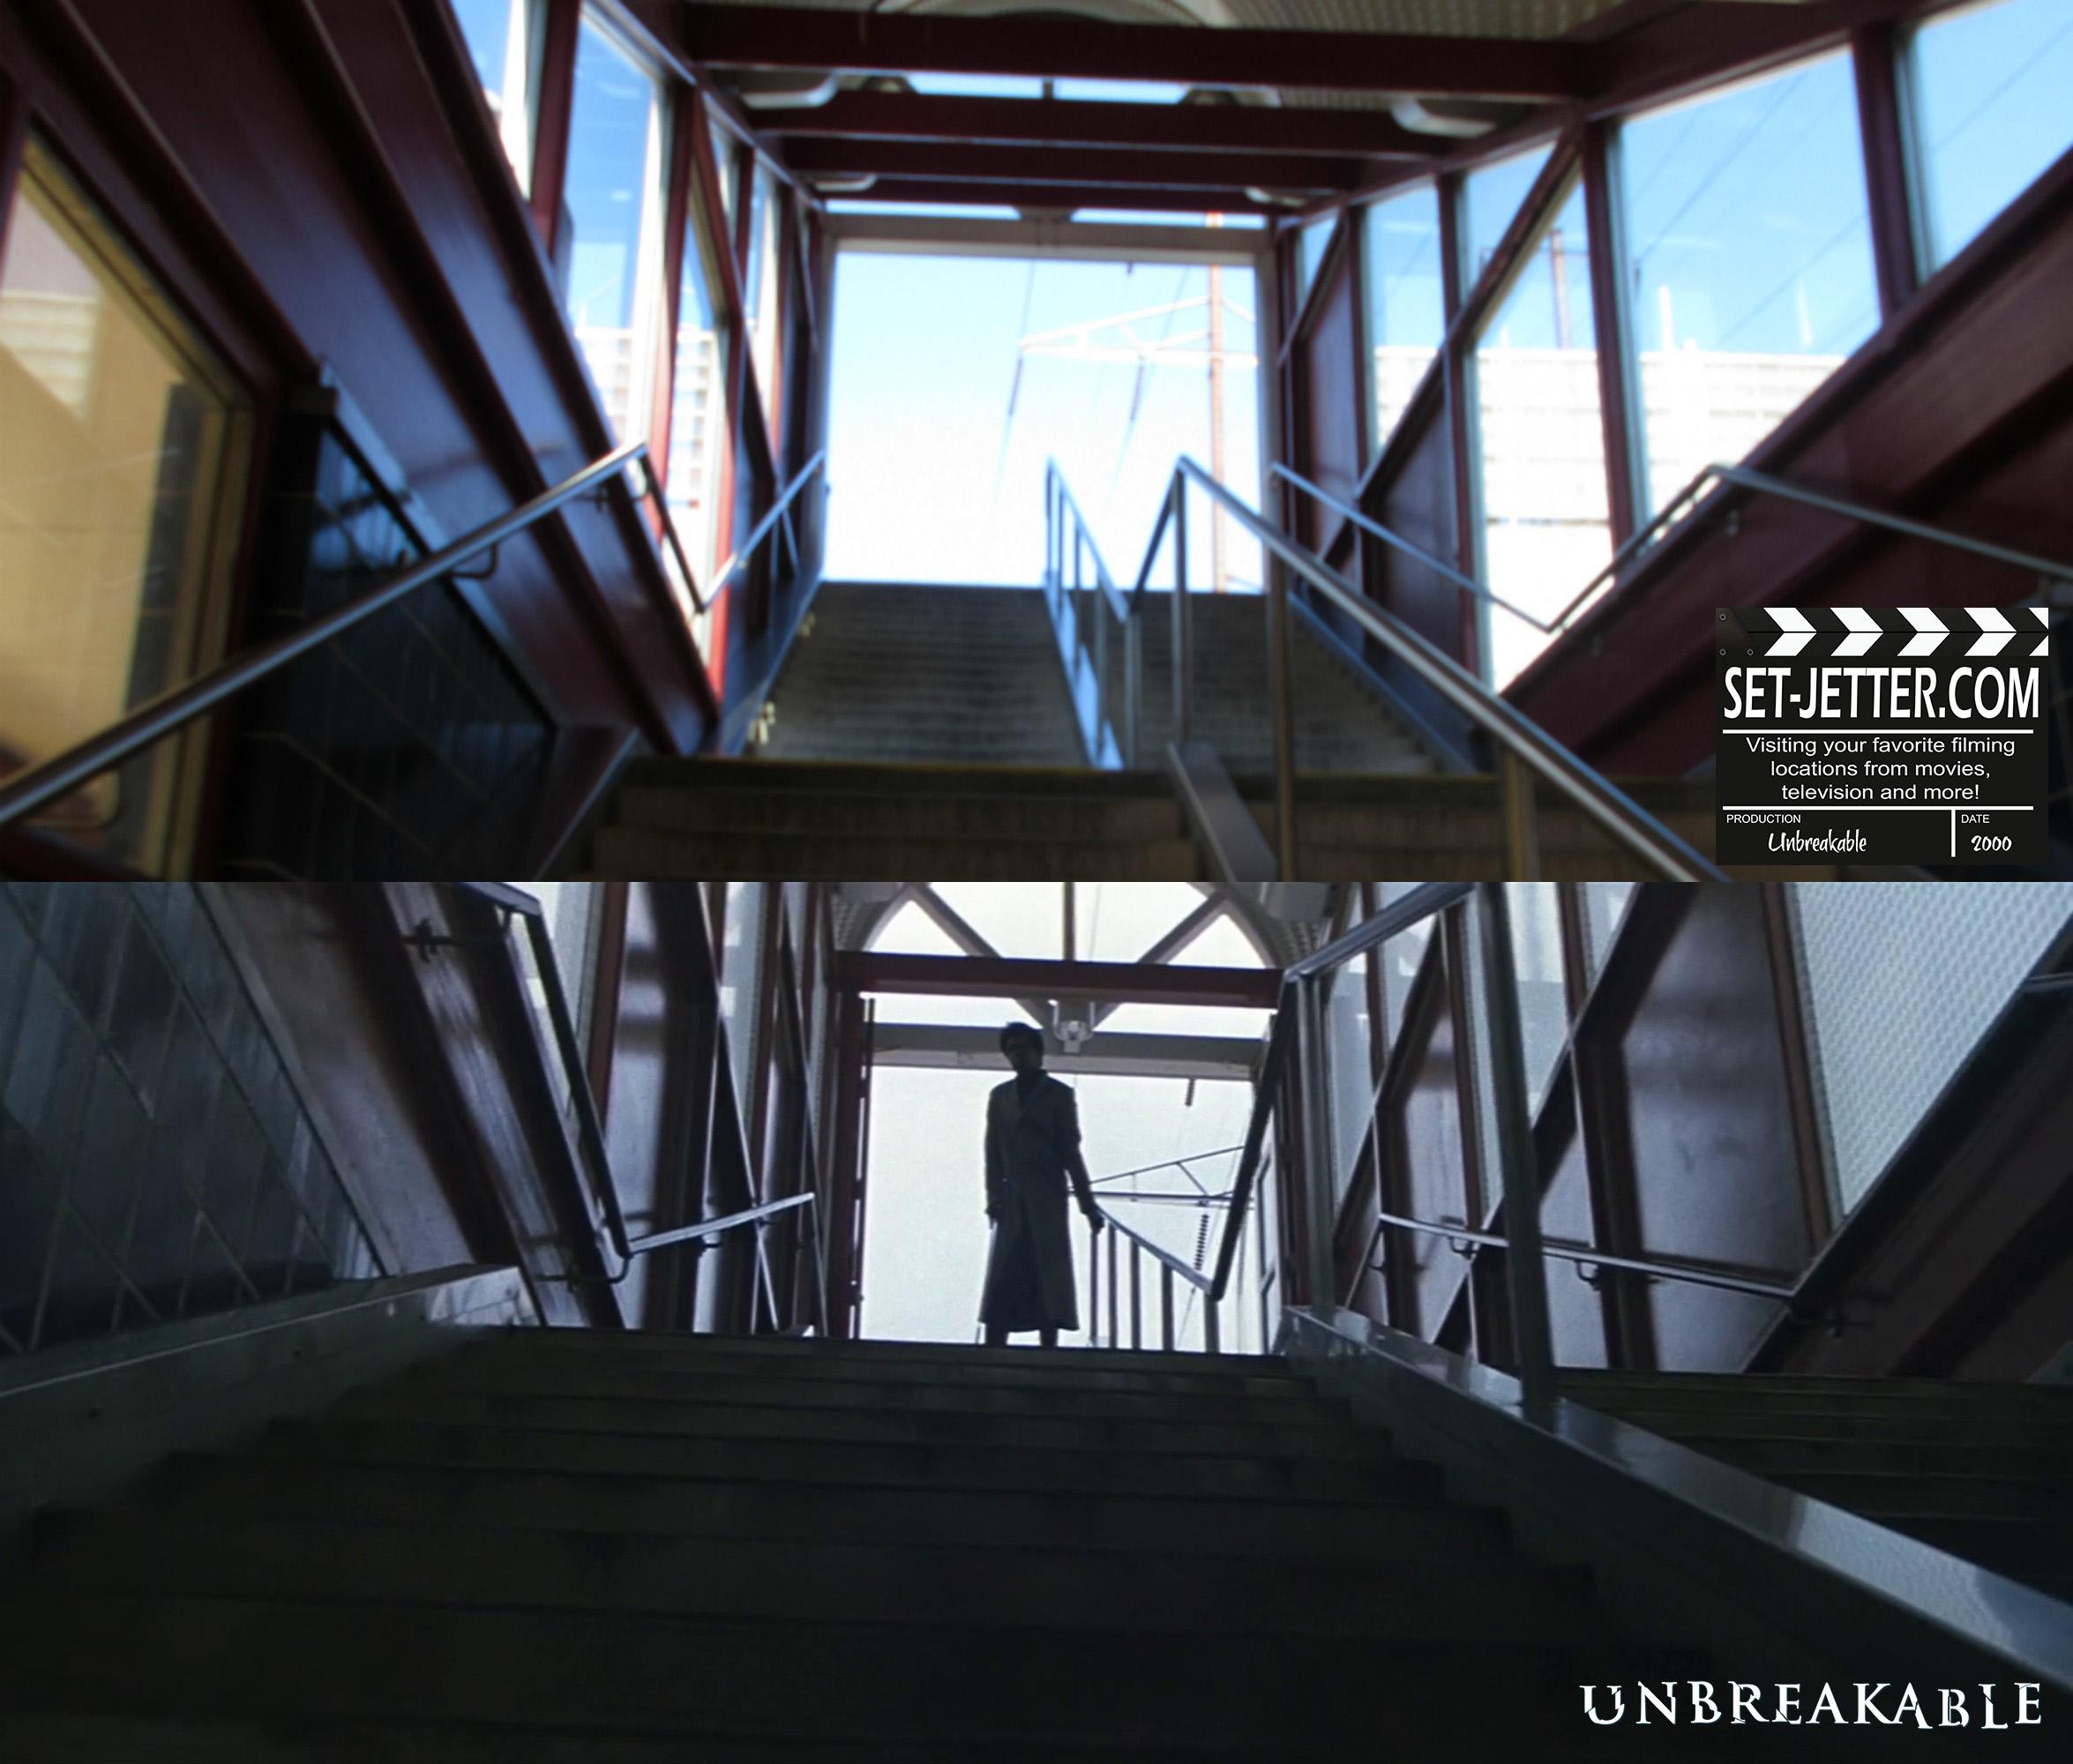 Unbreakable 068b.jpg